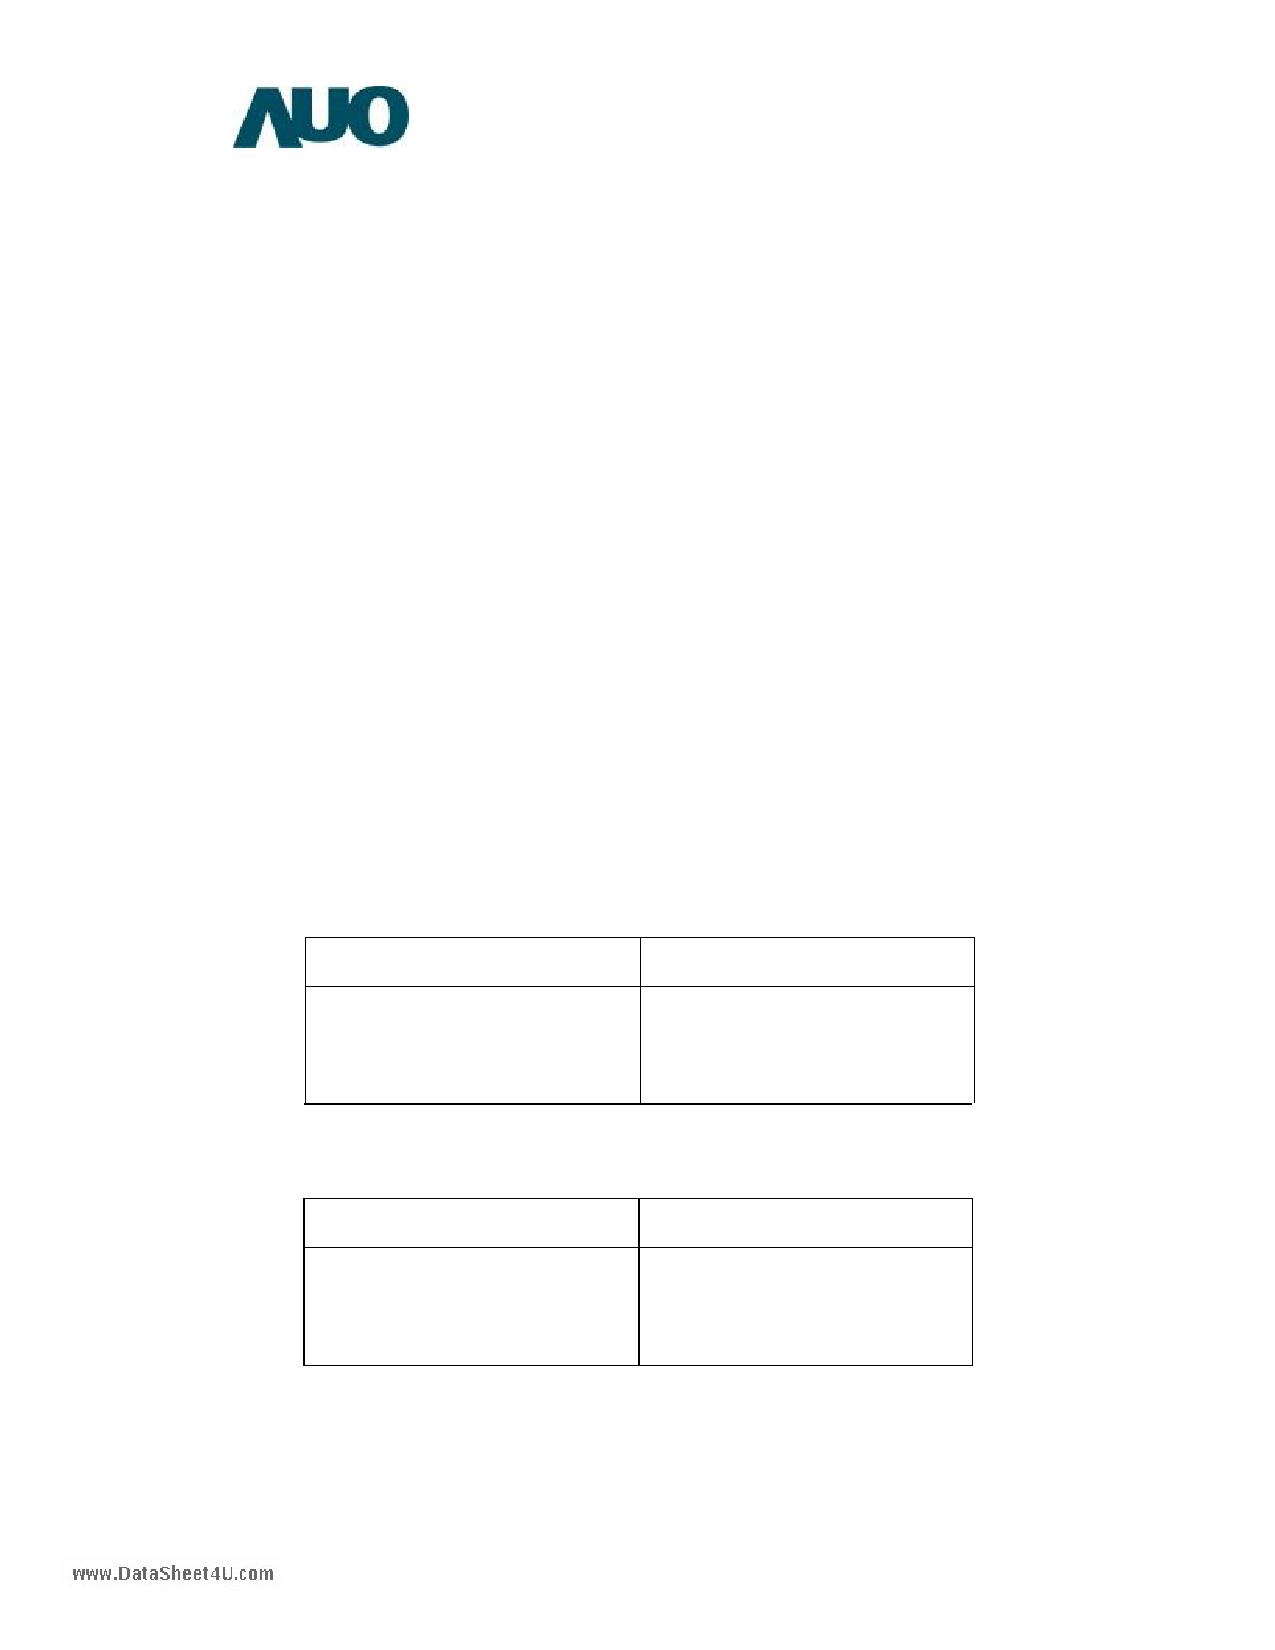 G084SN05-V4 datasheet